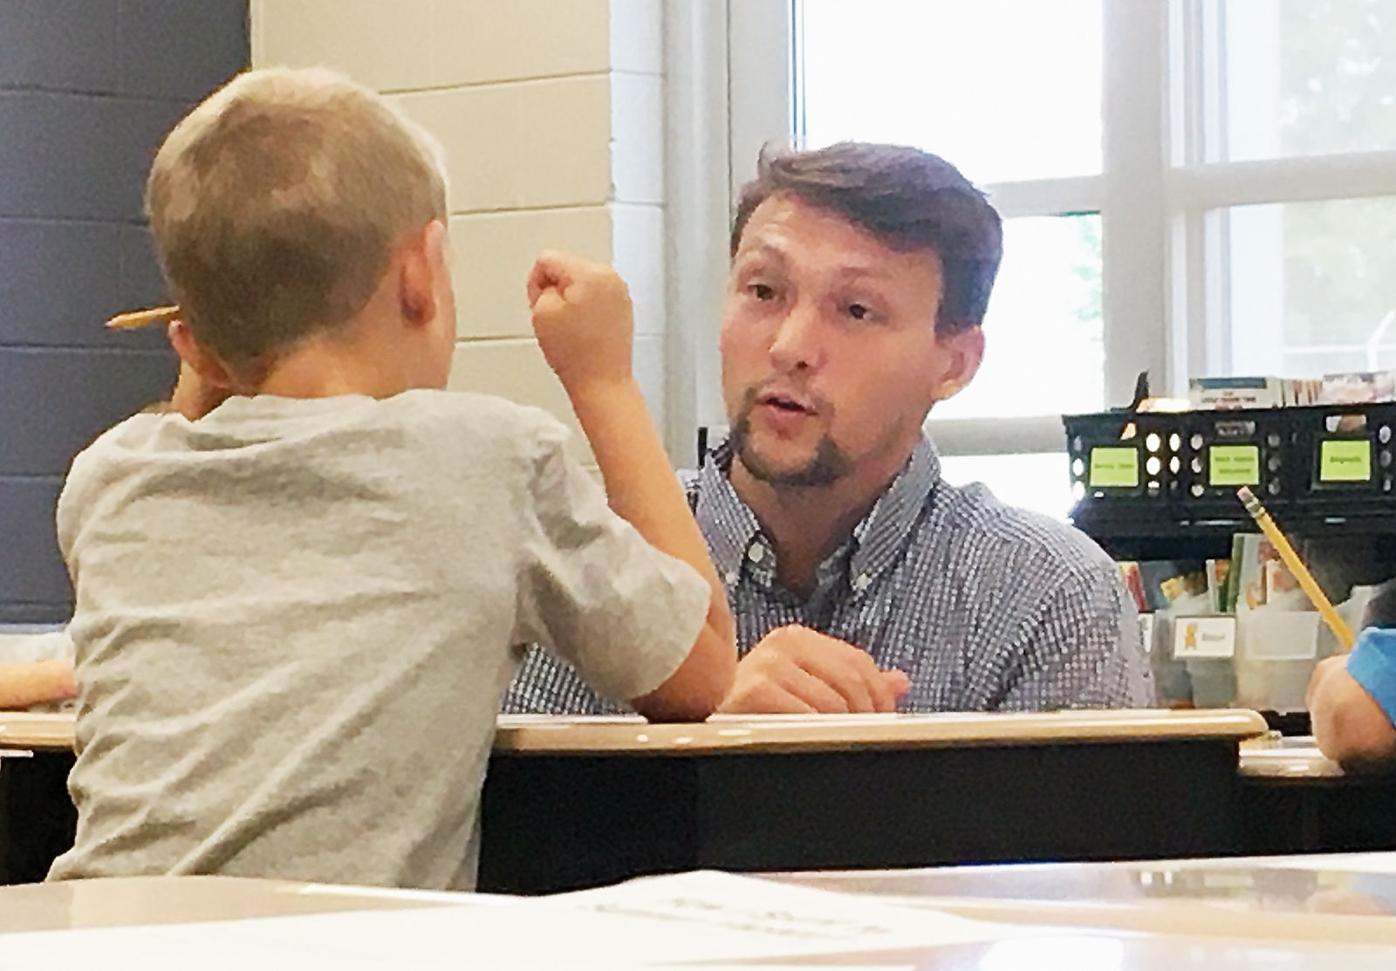 Teacher Addison Hatfield talks with second grader at Carpenters Elementary School